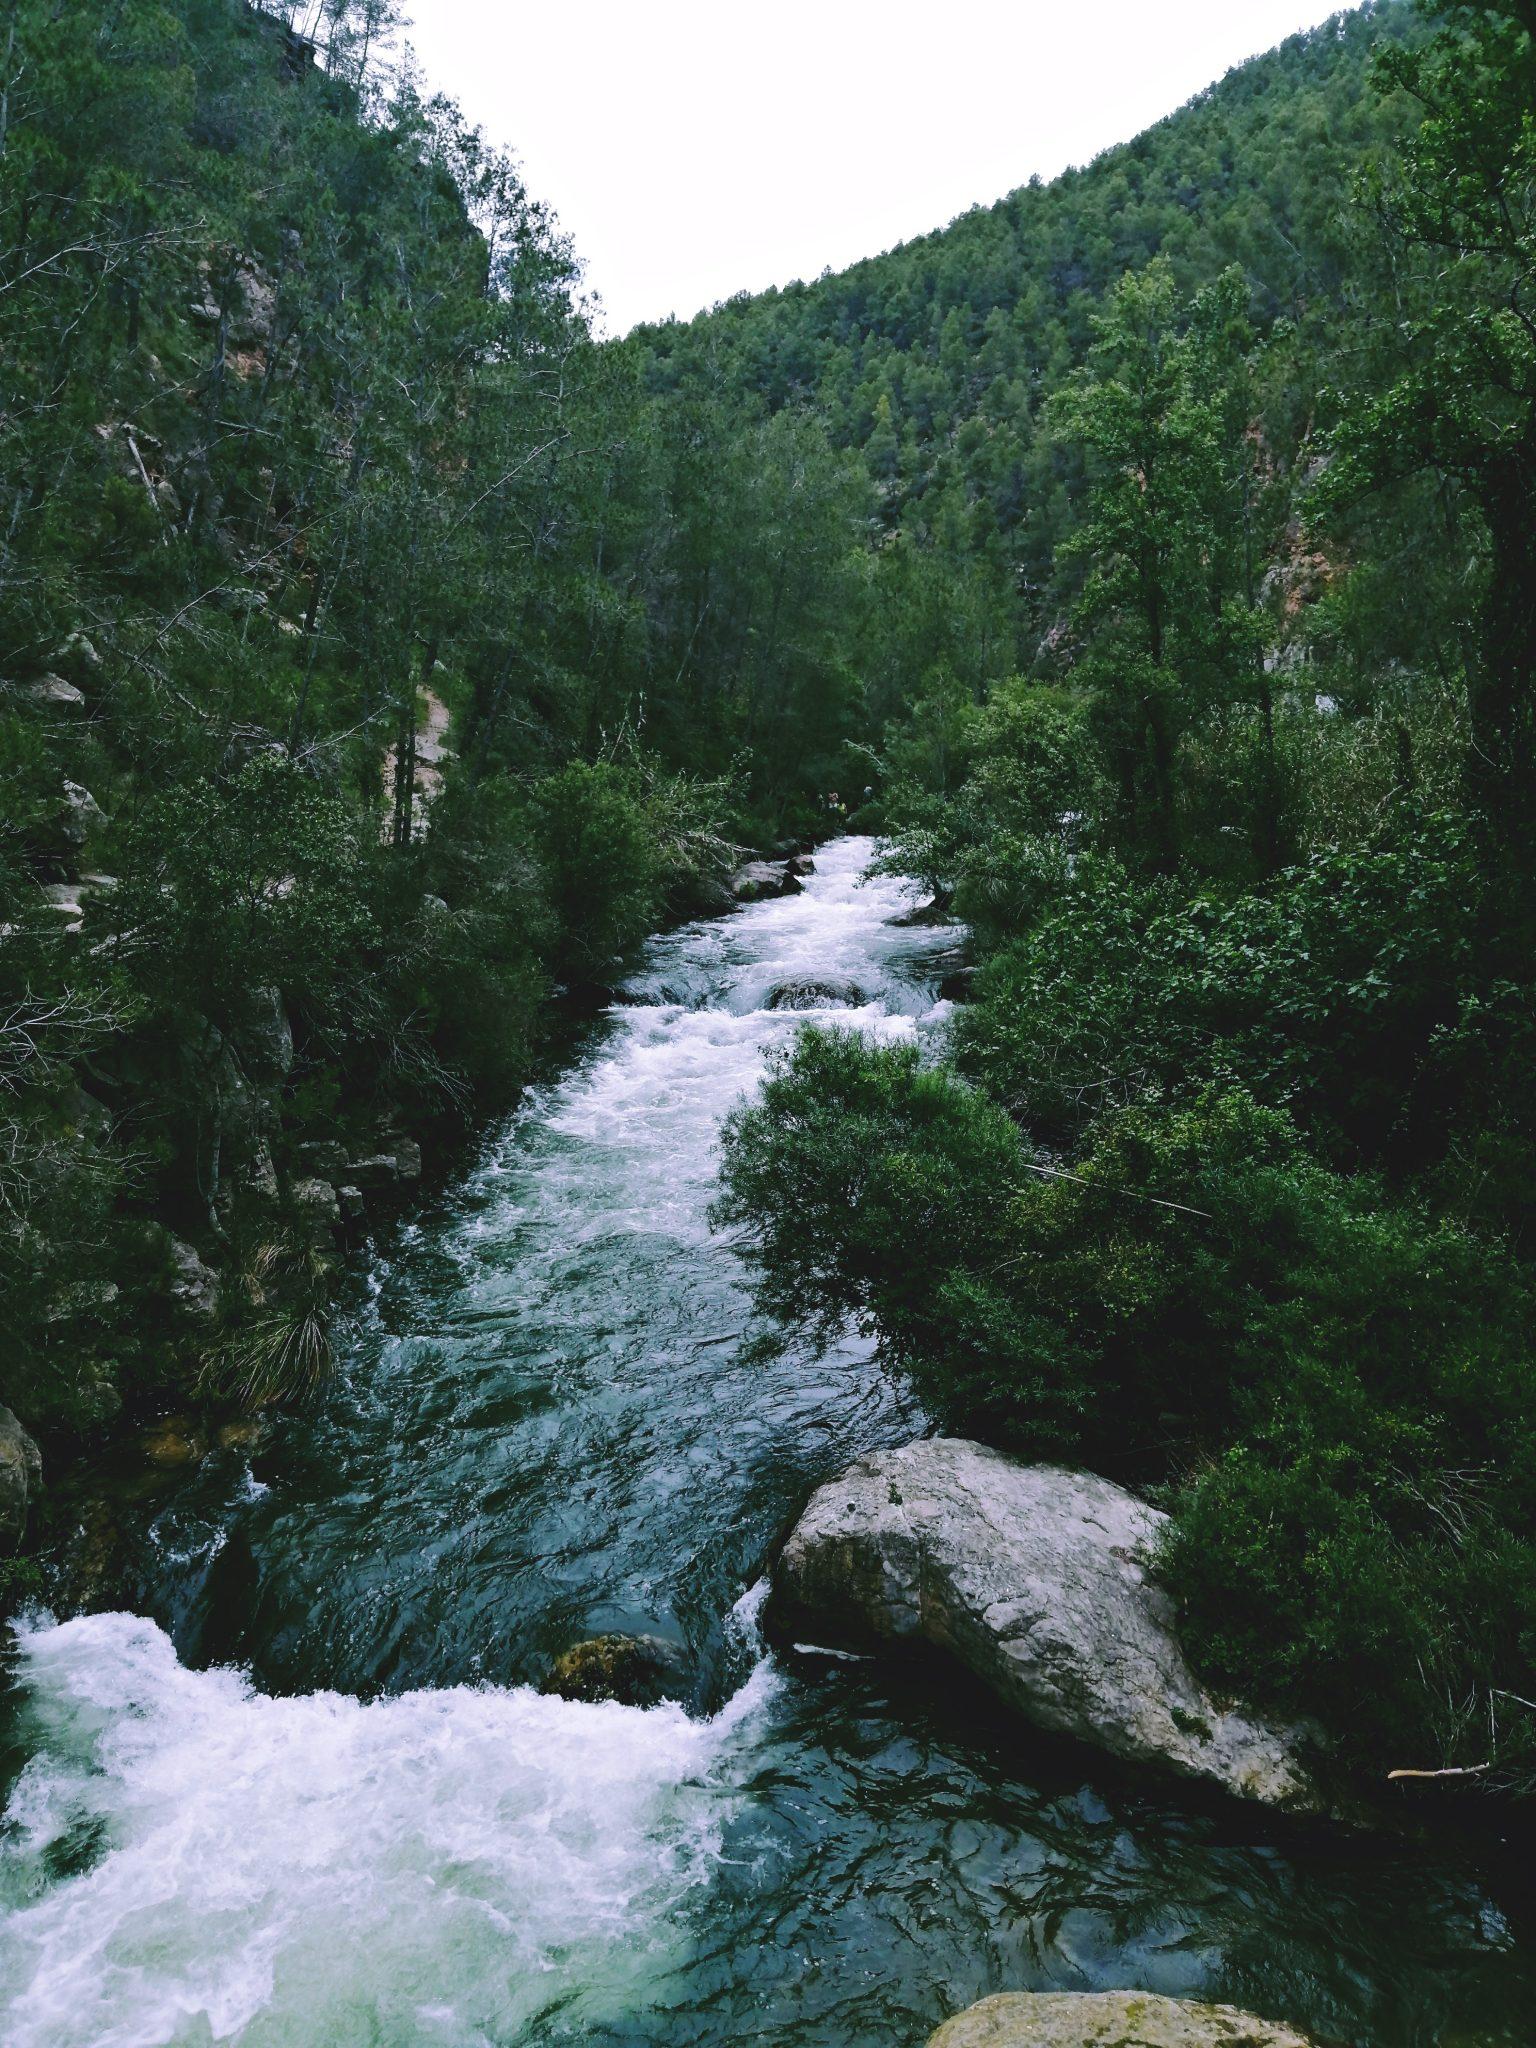 montanejos rijeka izvori termalnih voda